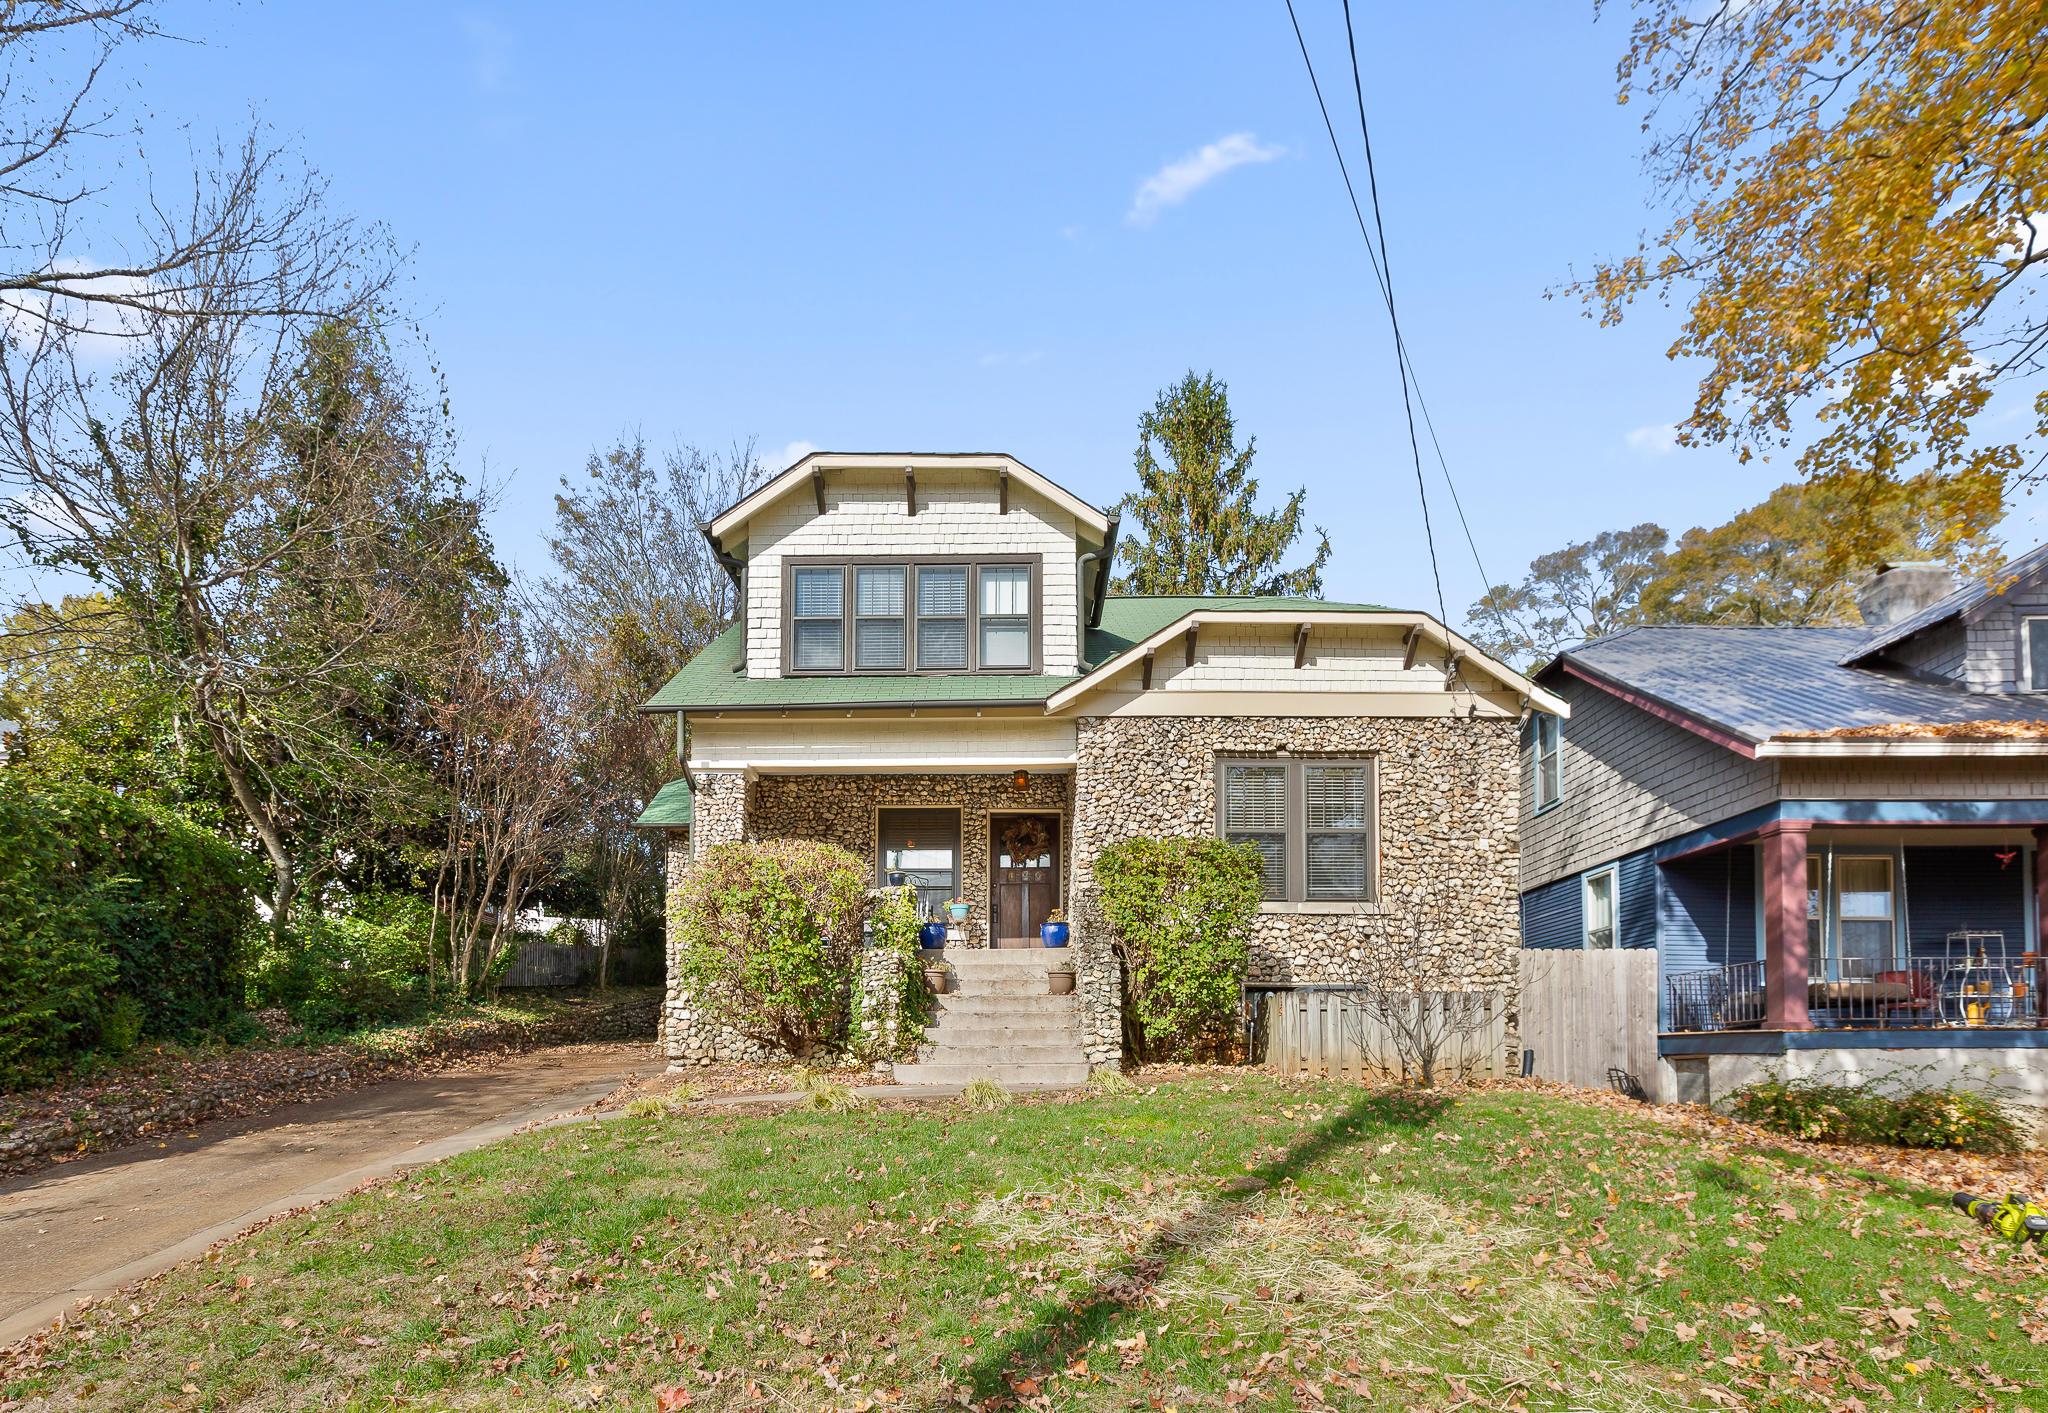 109 Shallowford Rd, Chattanooga, TN 37404